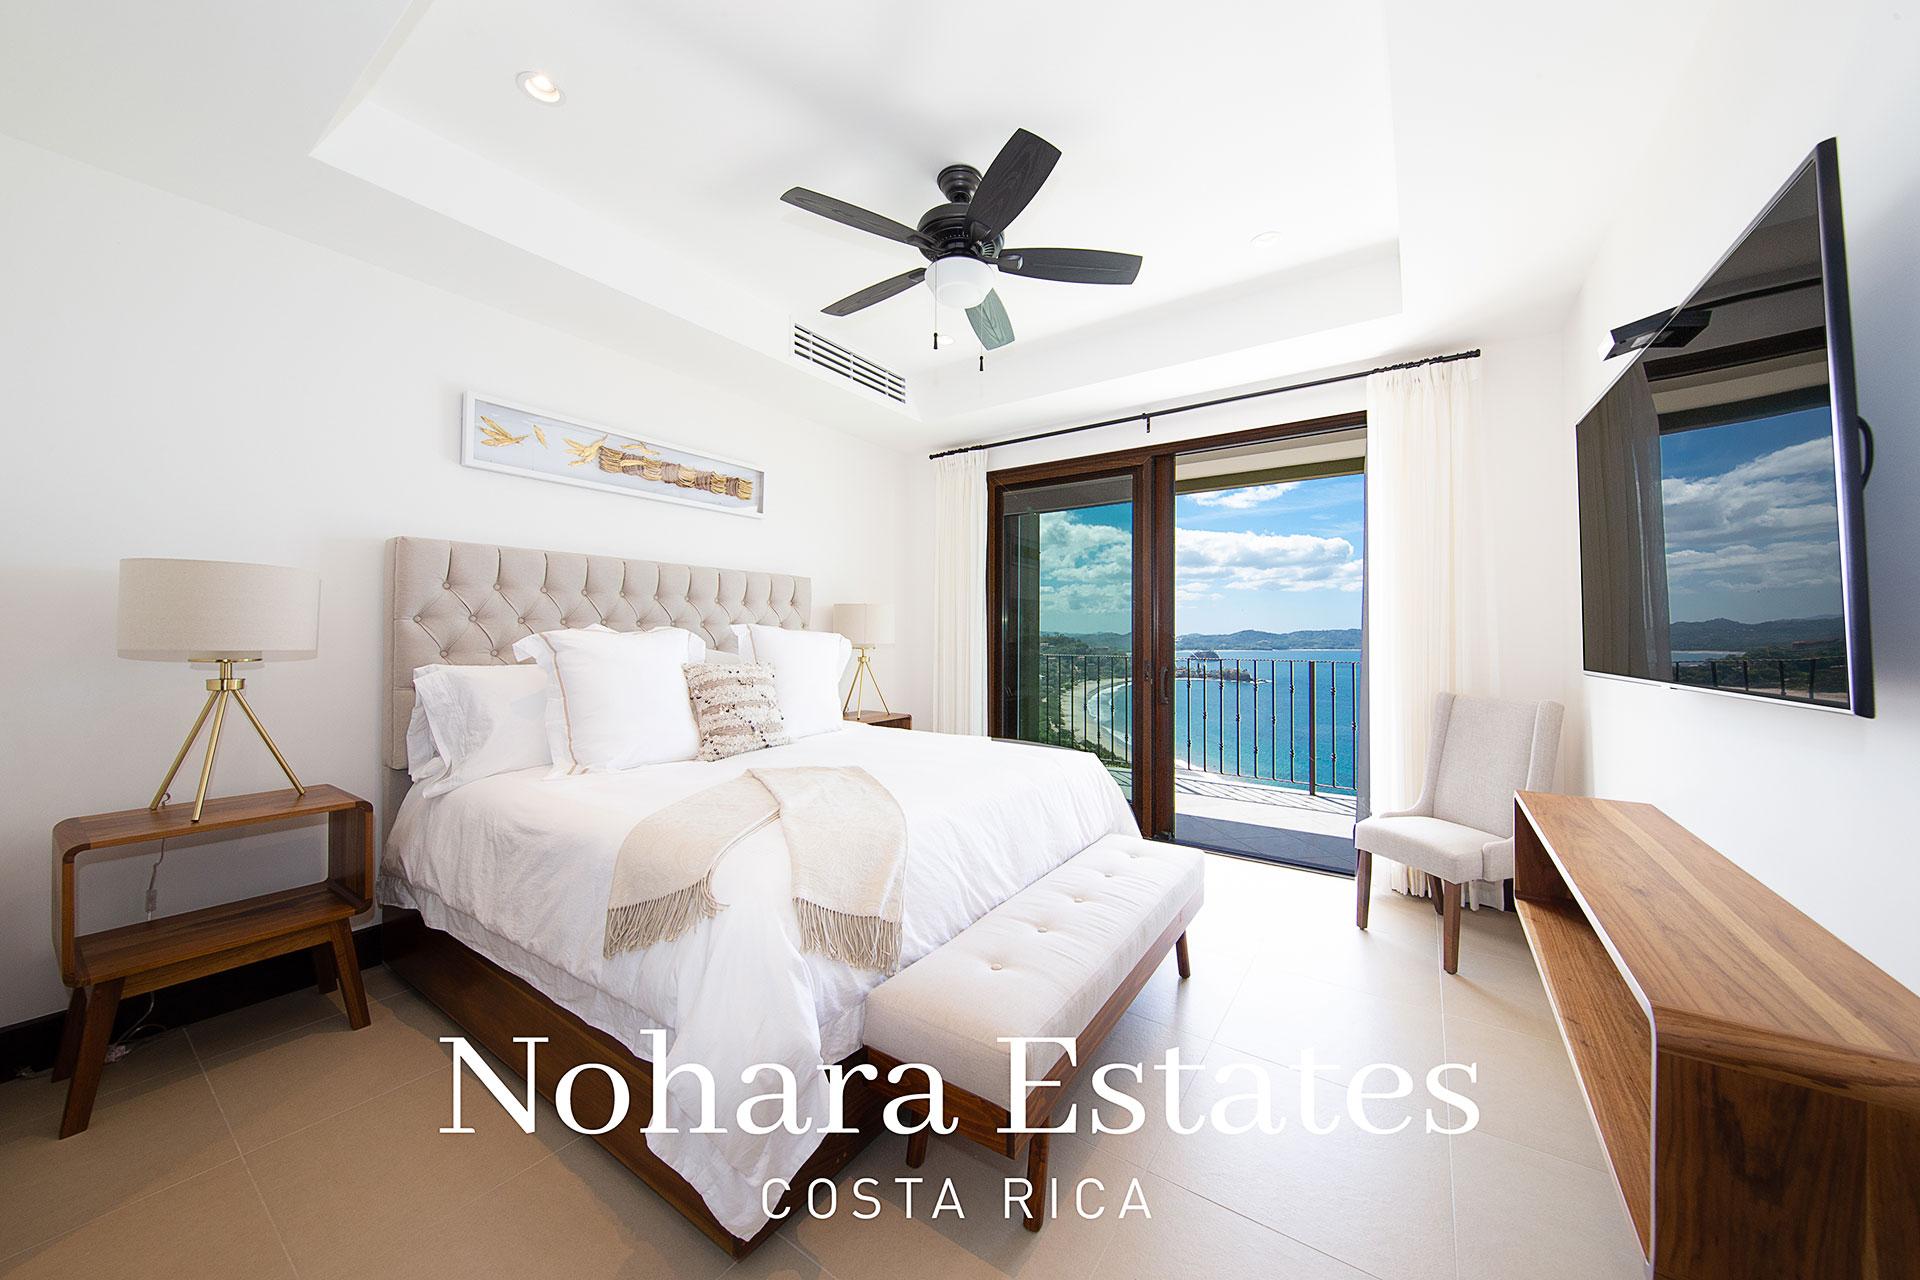 Nohara Estates Costa Rica 360 Esplendor Del Pacifico 6